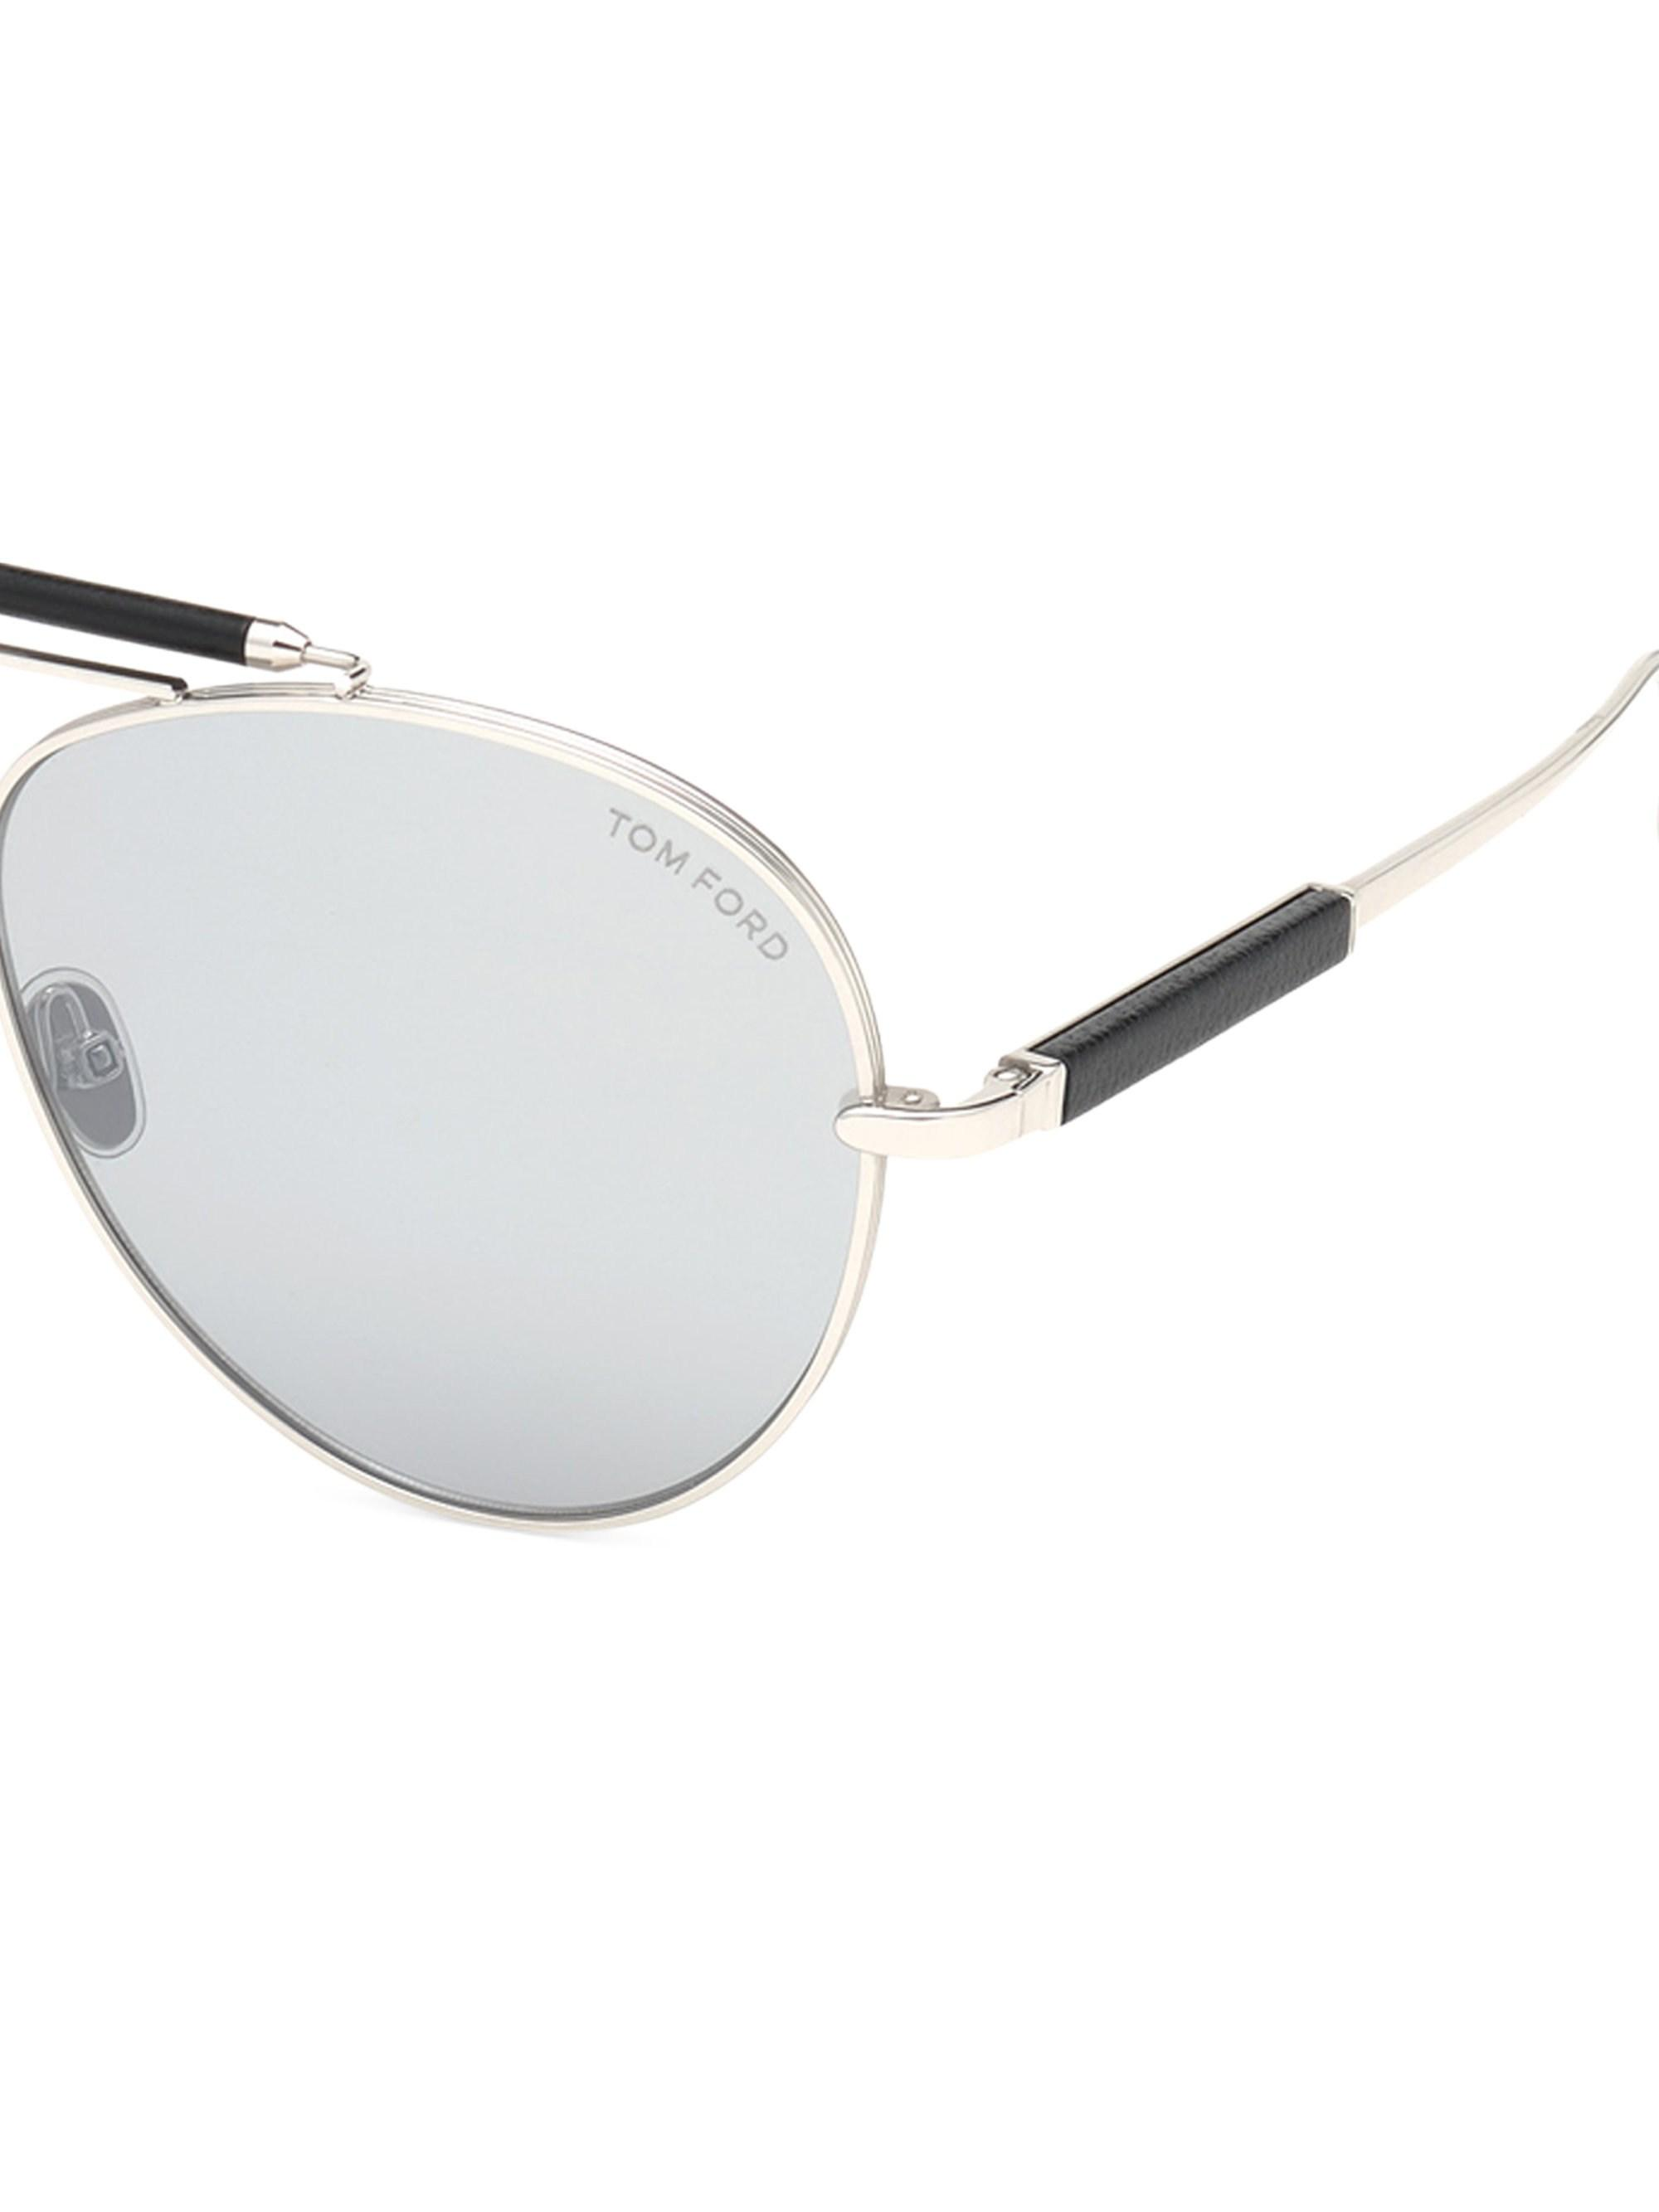 b34612a3e303c Tom Ford Men s Metal Aviator Sunglasses With Mirrored Photochromic ...